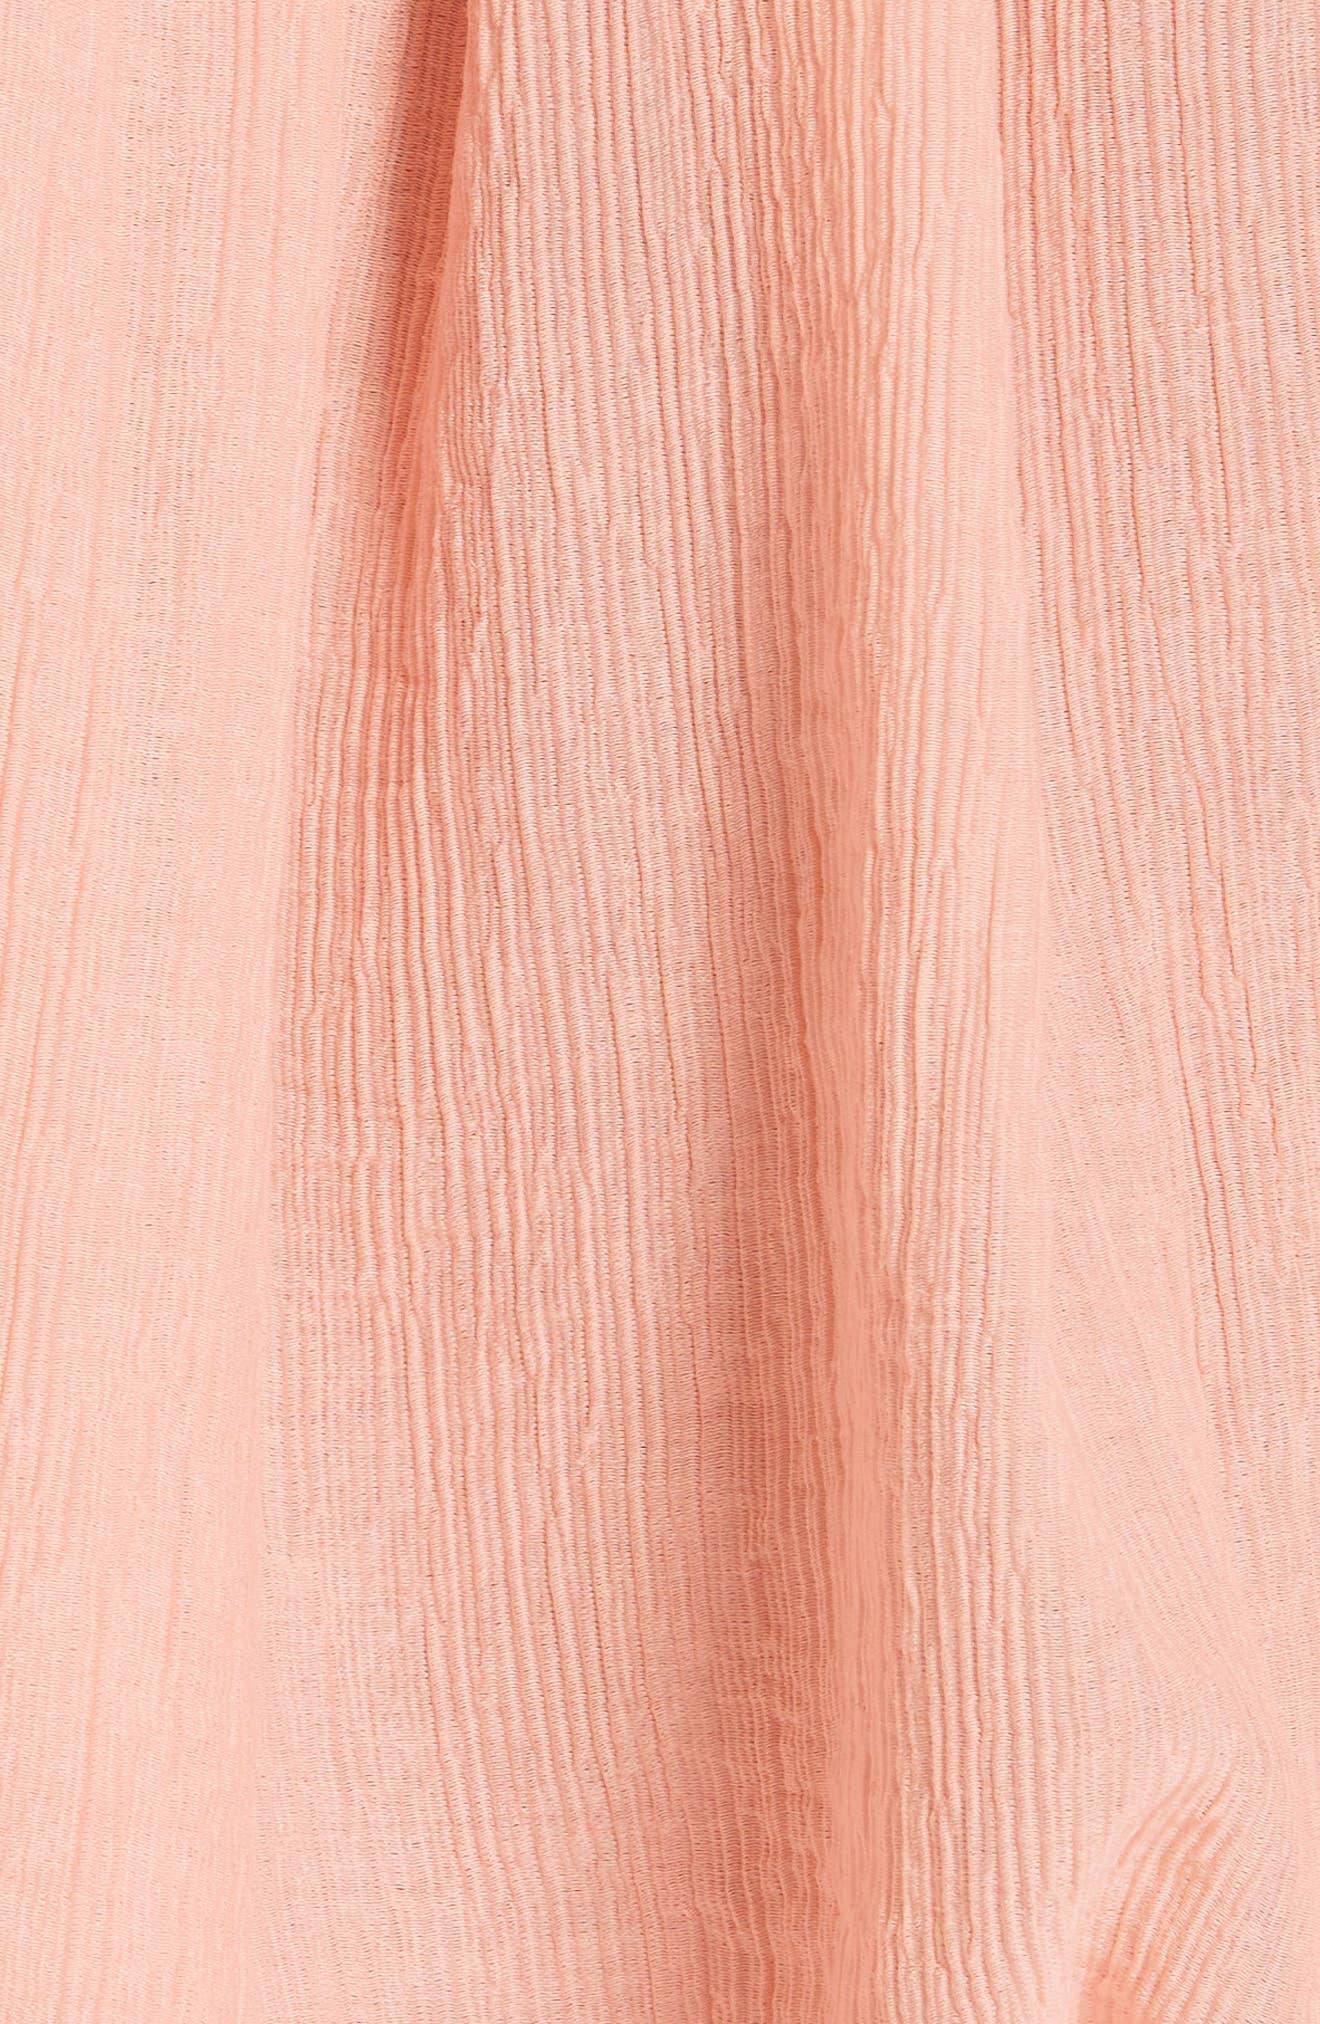 Elazara Ruched Sleeve Peasant Top,                             Alternate thumbnail 5, color,                             958